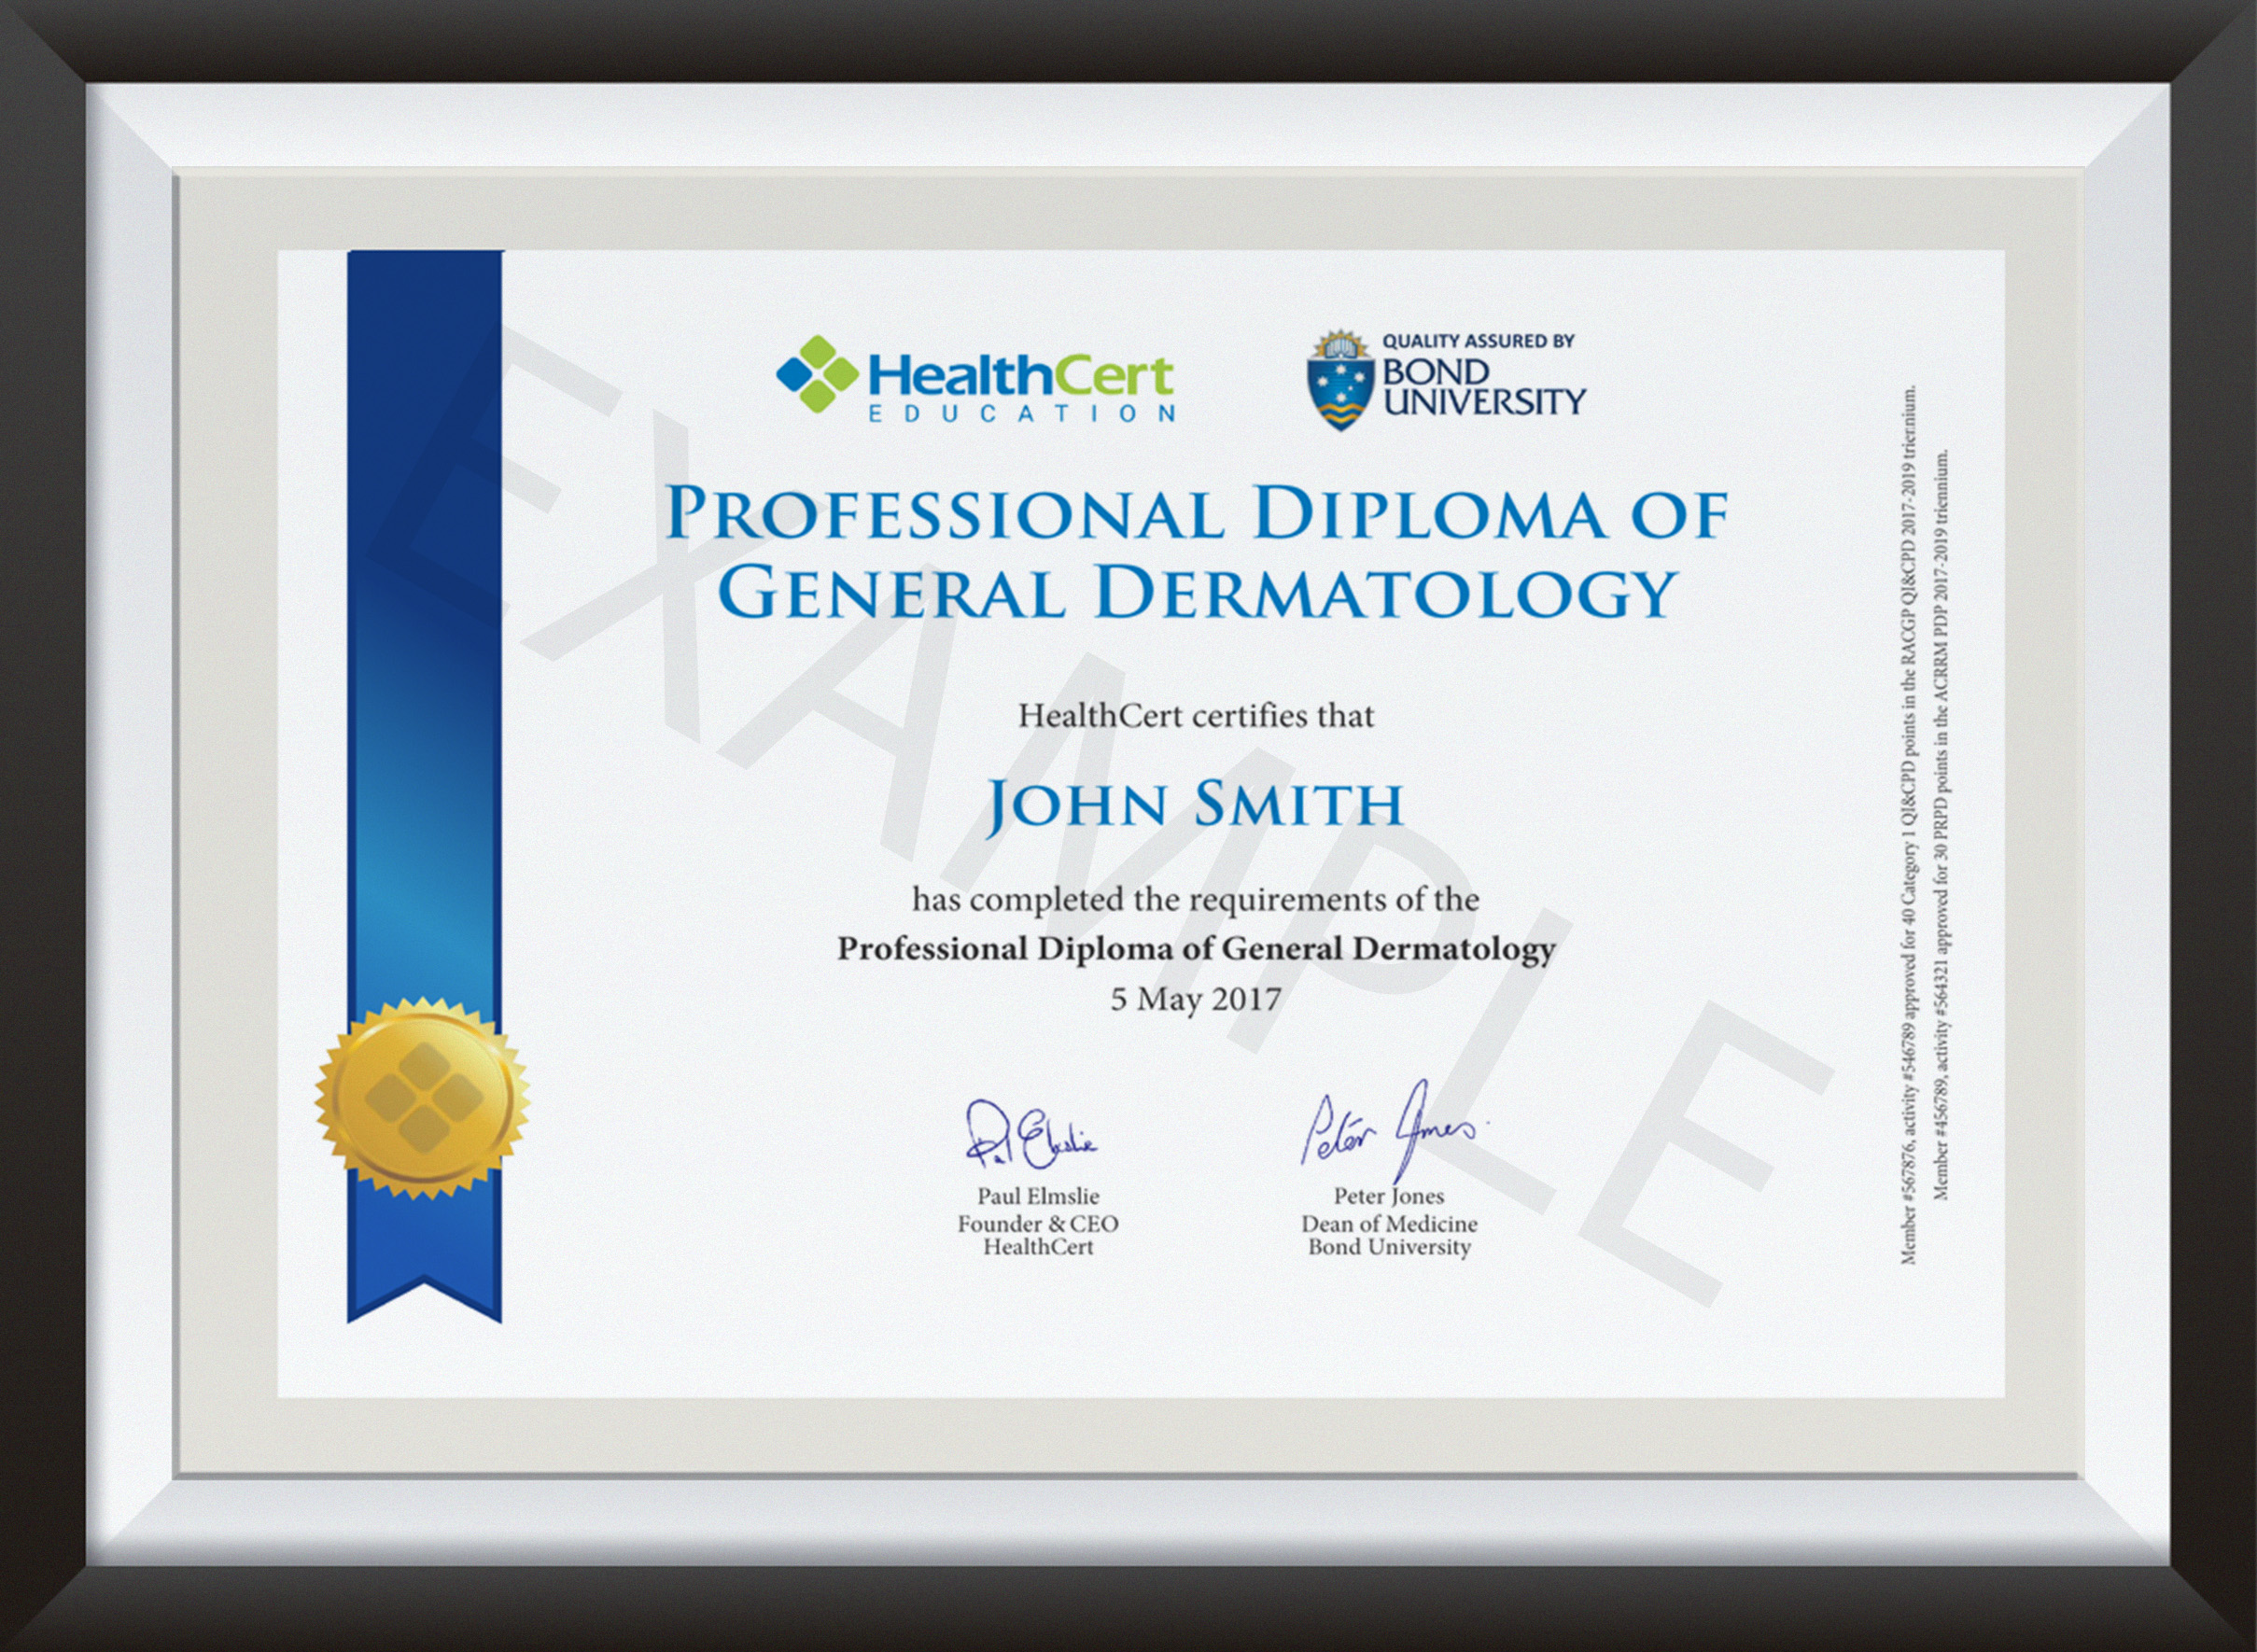 Professional Diploma of General Dermatology